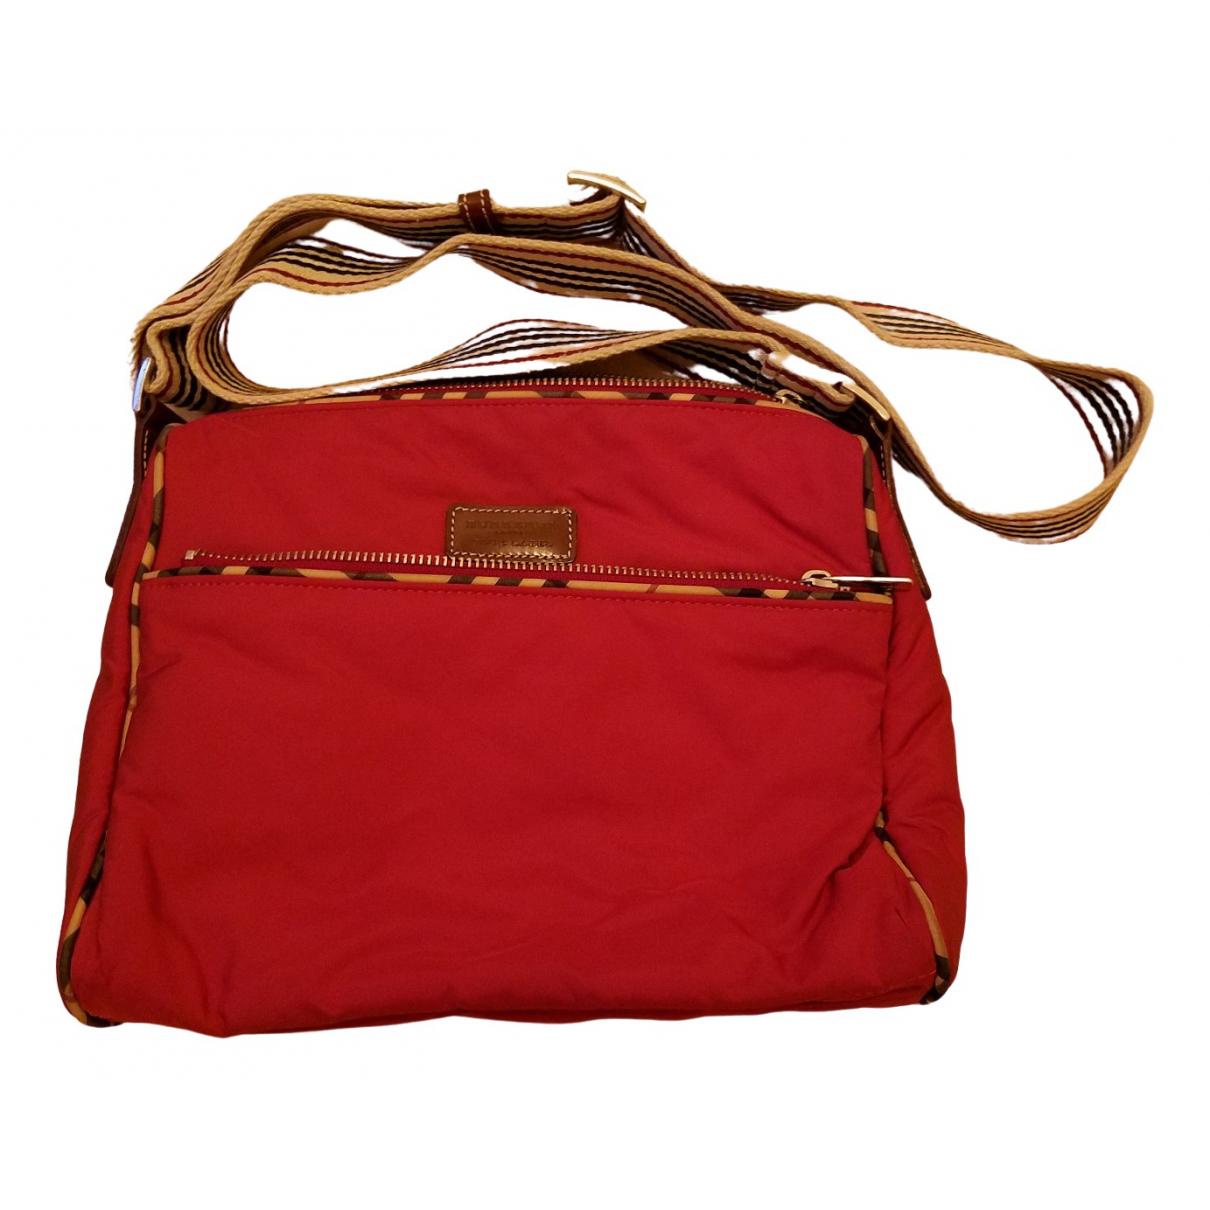 Burberry \N Red Cloth handbag for Women \N